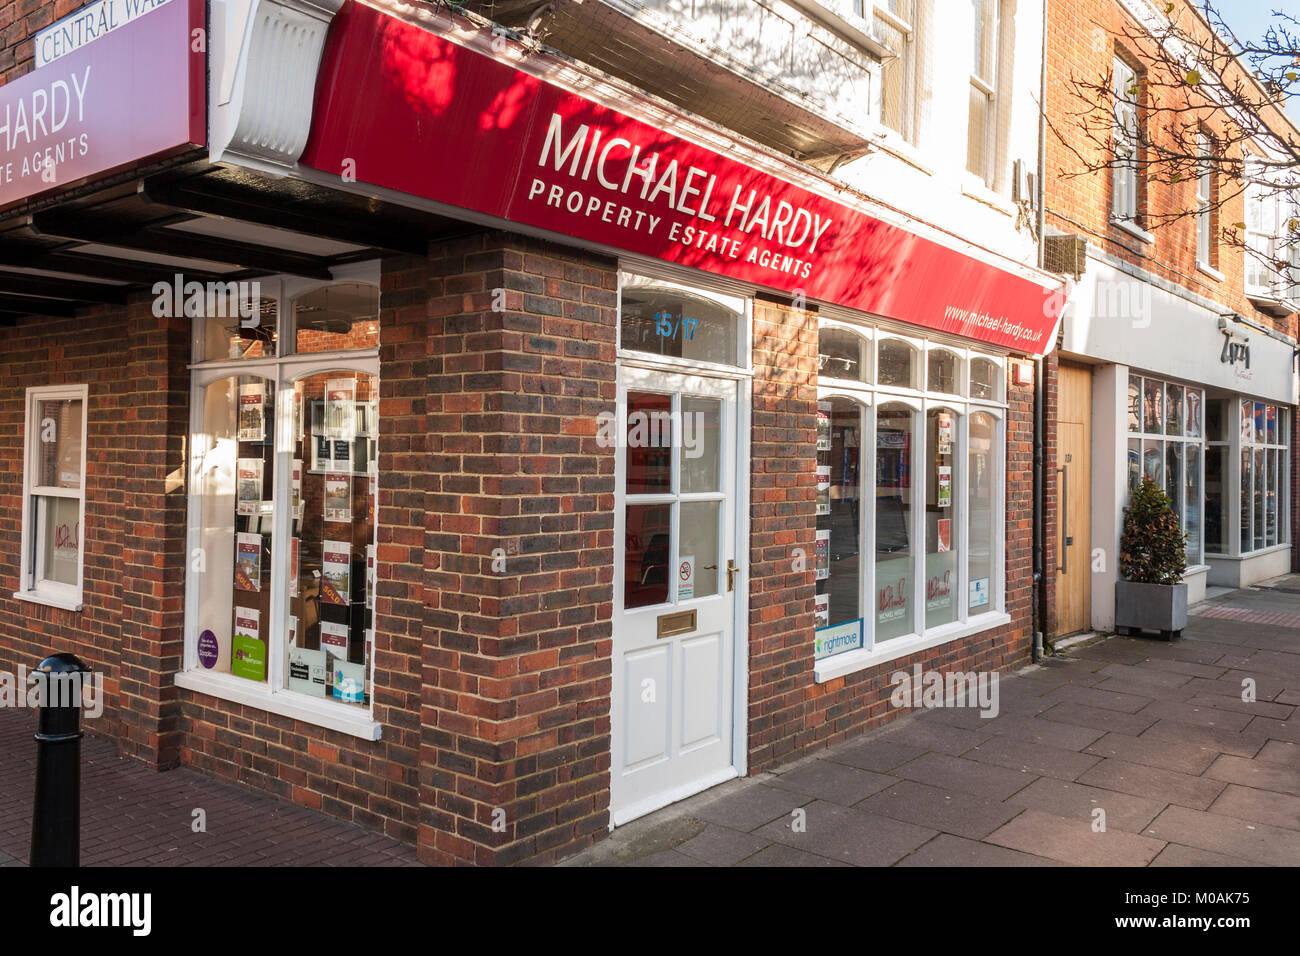 Michael Hardy property estate agents, Wokingham, Berkshire, England, GB, UK - Stock Image